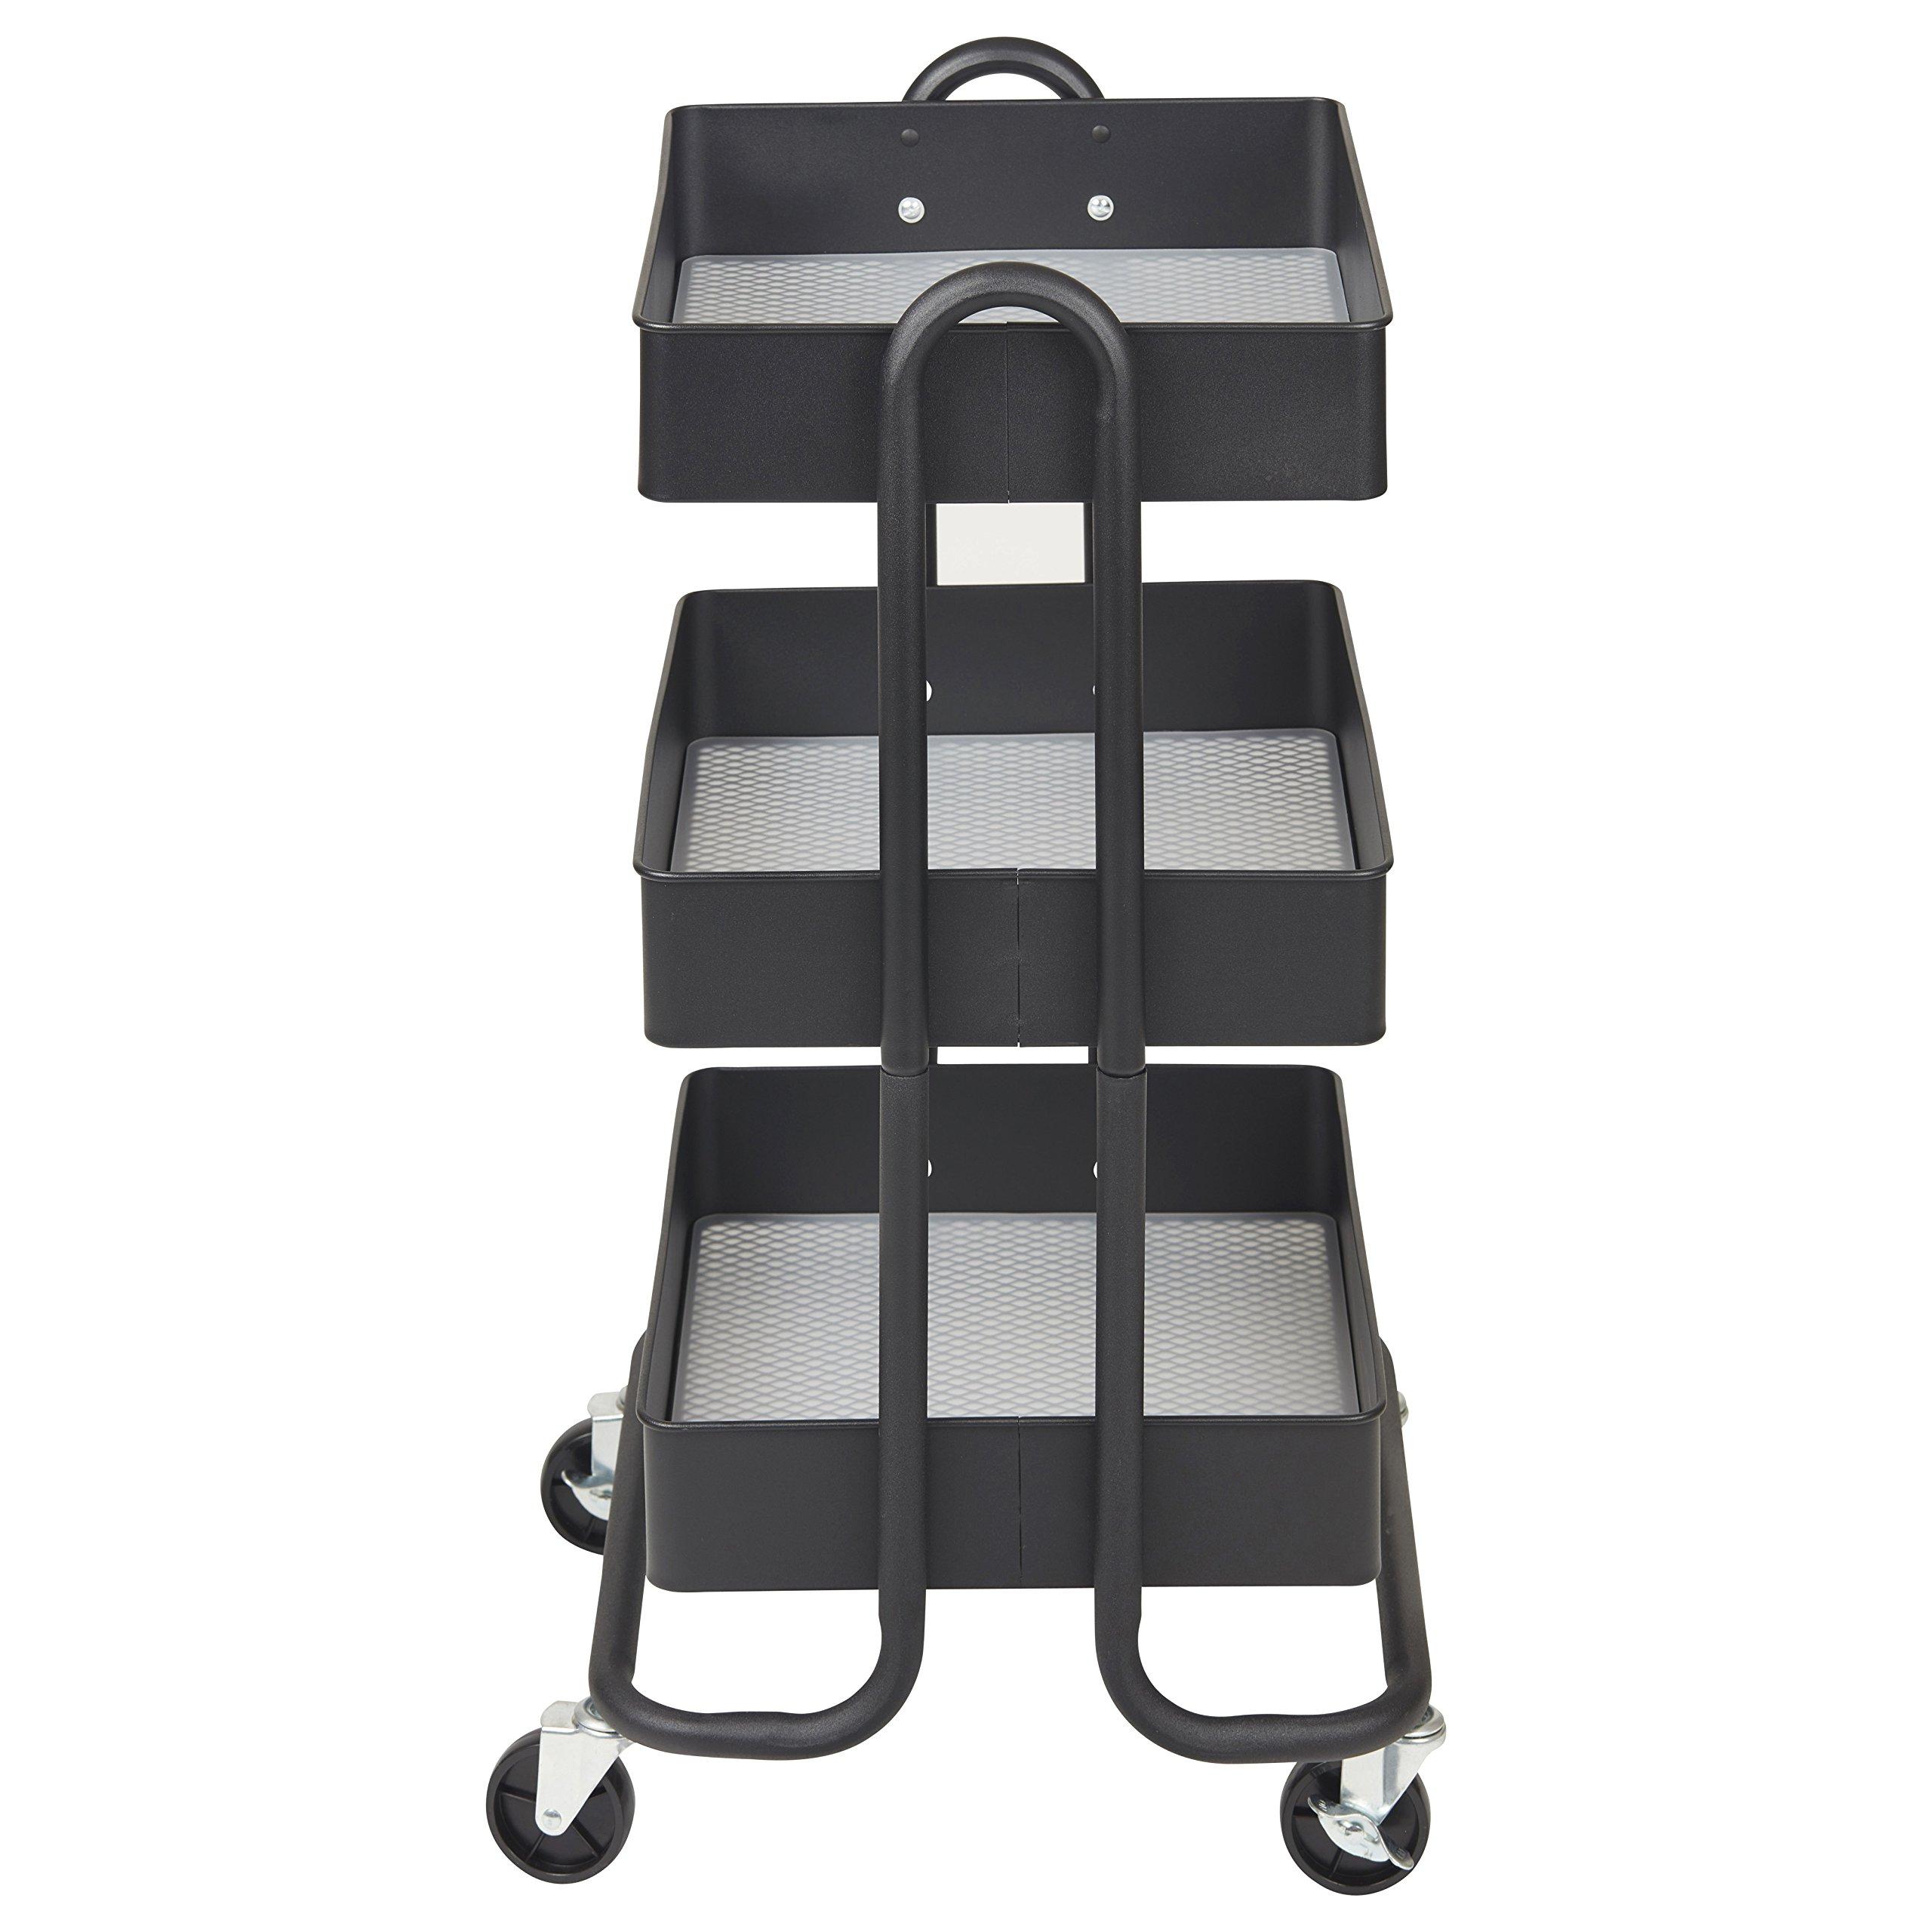 ECR4Kids 3-Tier Metal Rolling Utility Cart - Heavy Duty Mobile Storage Organizer, Black by ECR4Kids (Image #2)